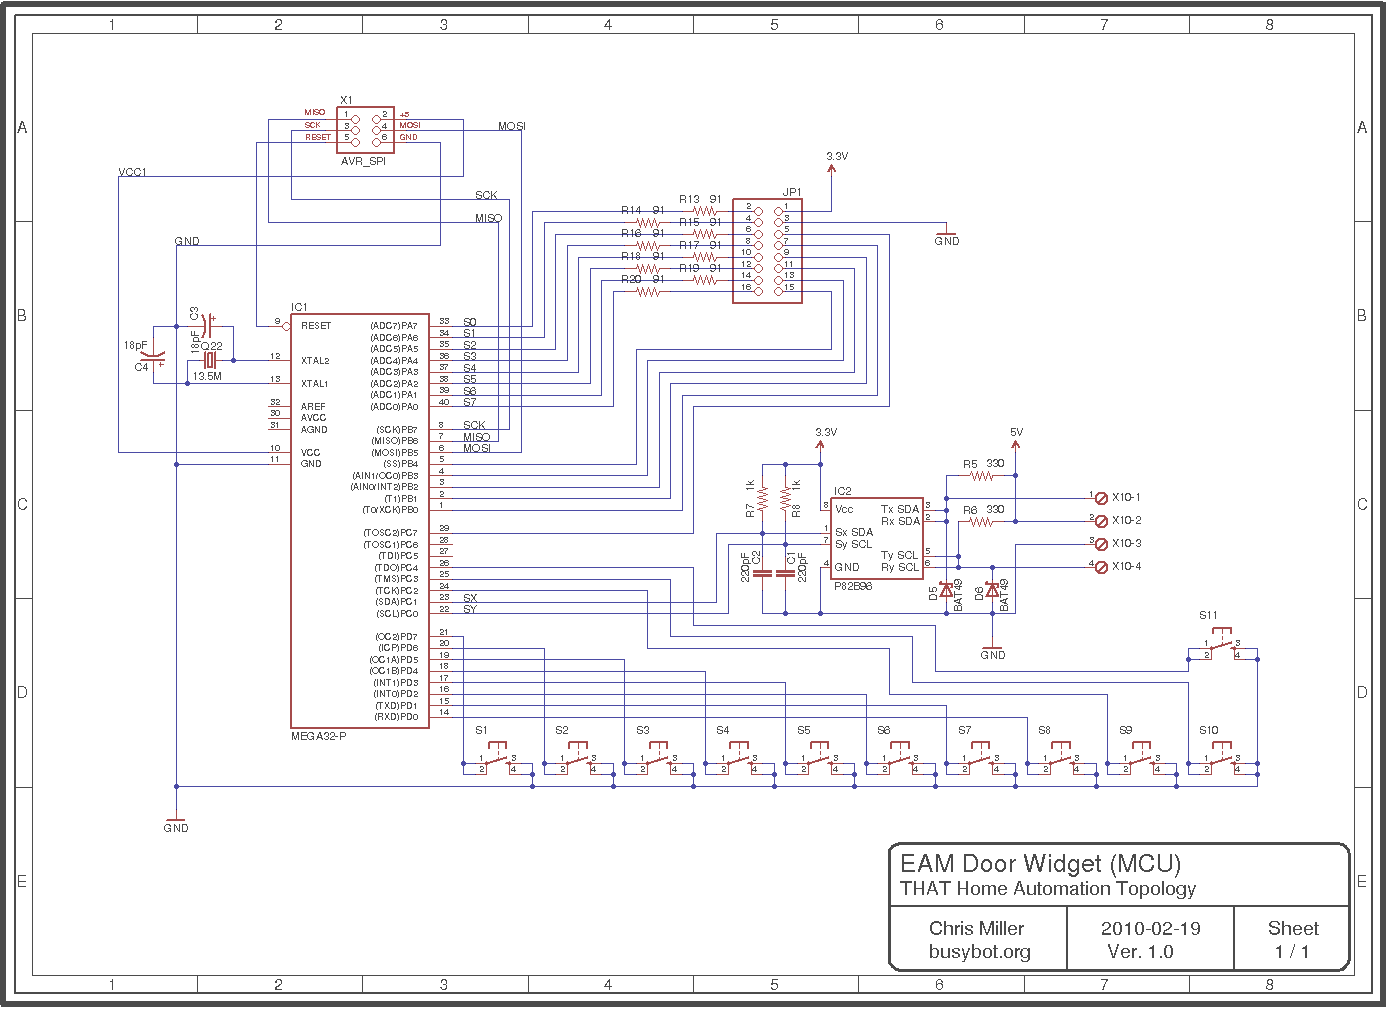 That Electronic Access Module